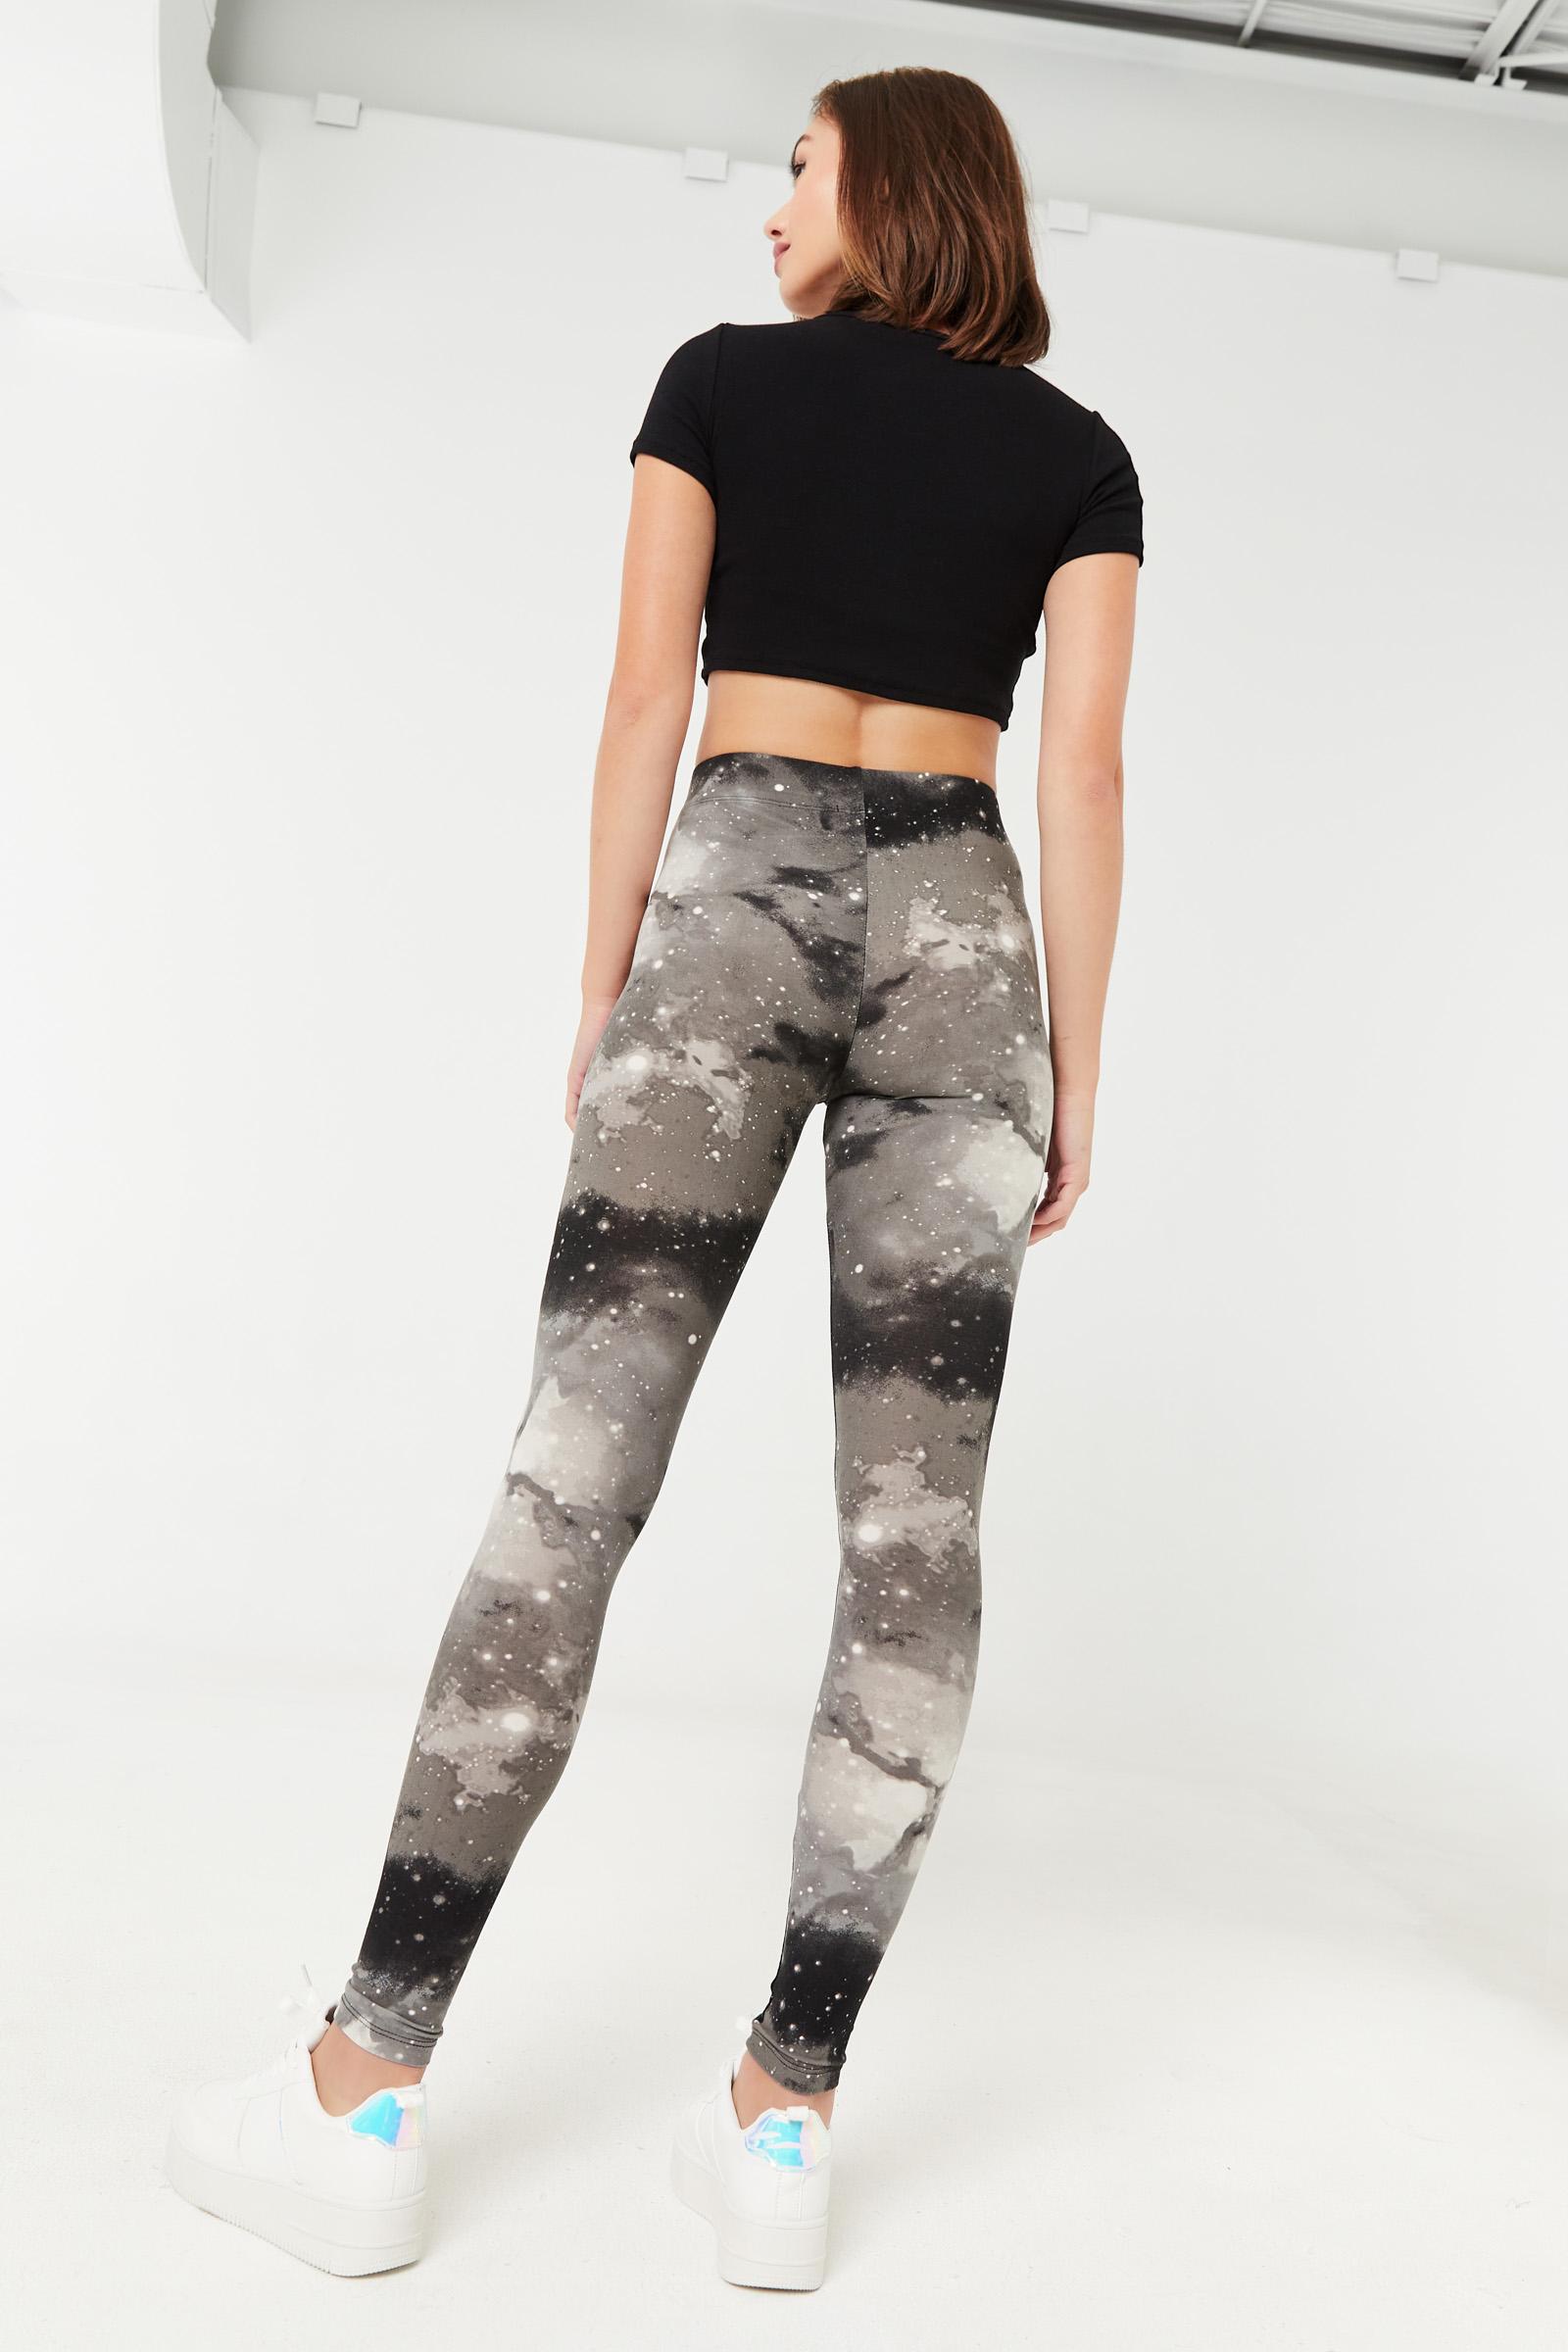 Black Galaxy Super Soft Leggings